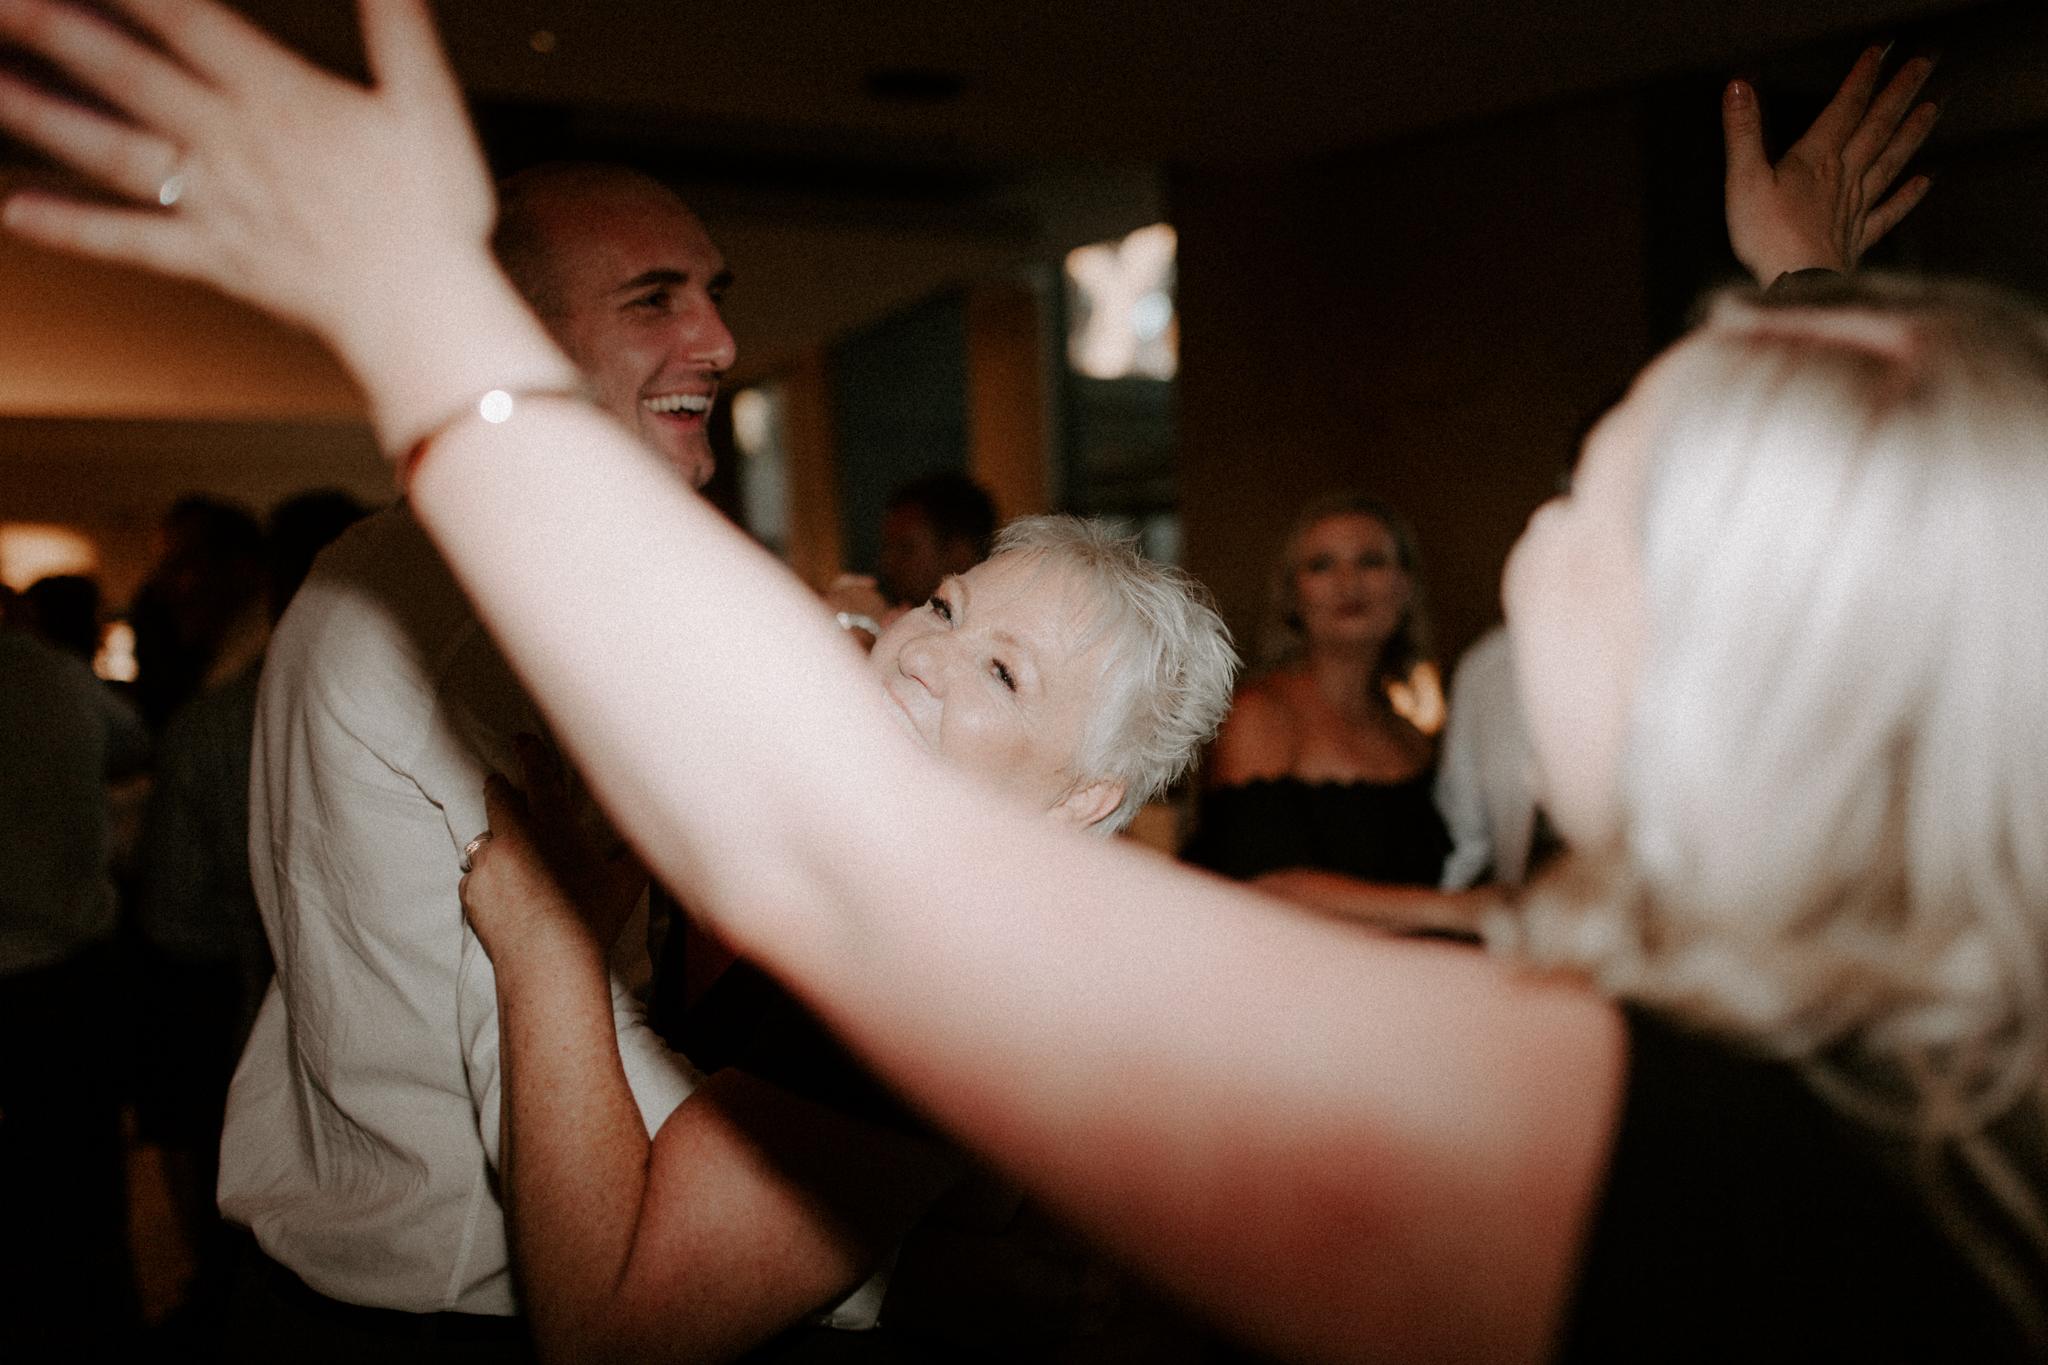 St-Kilda-Garden-Wedding-Emotions-and-Math-Photograph-219.jpg